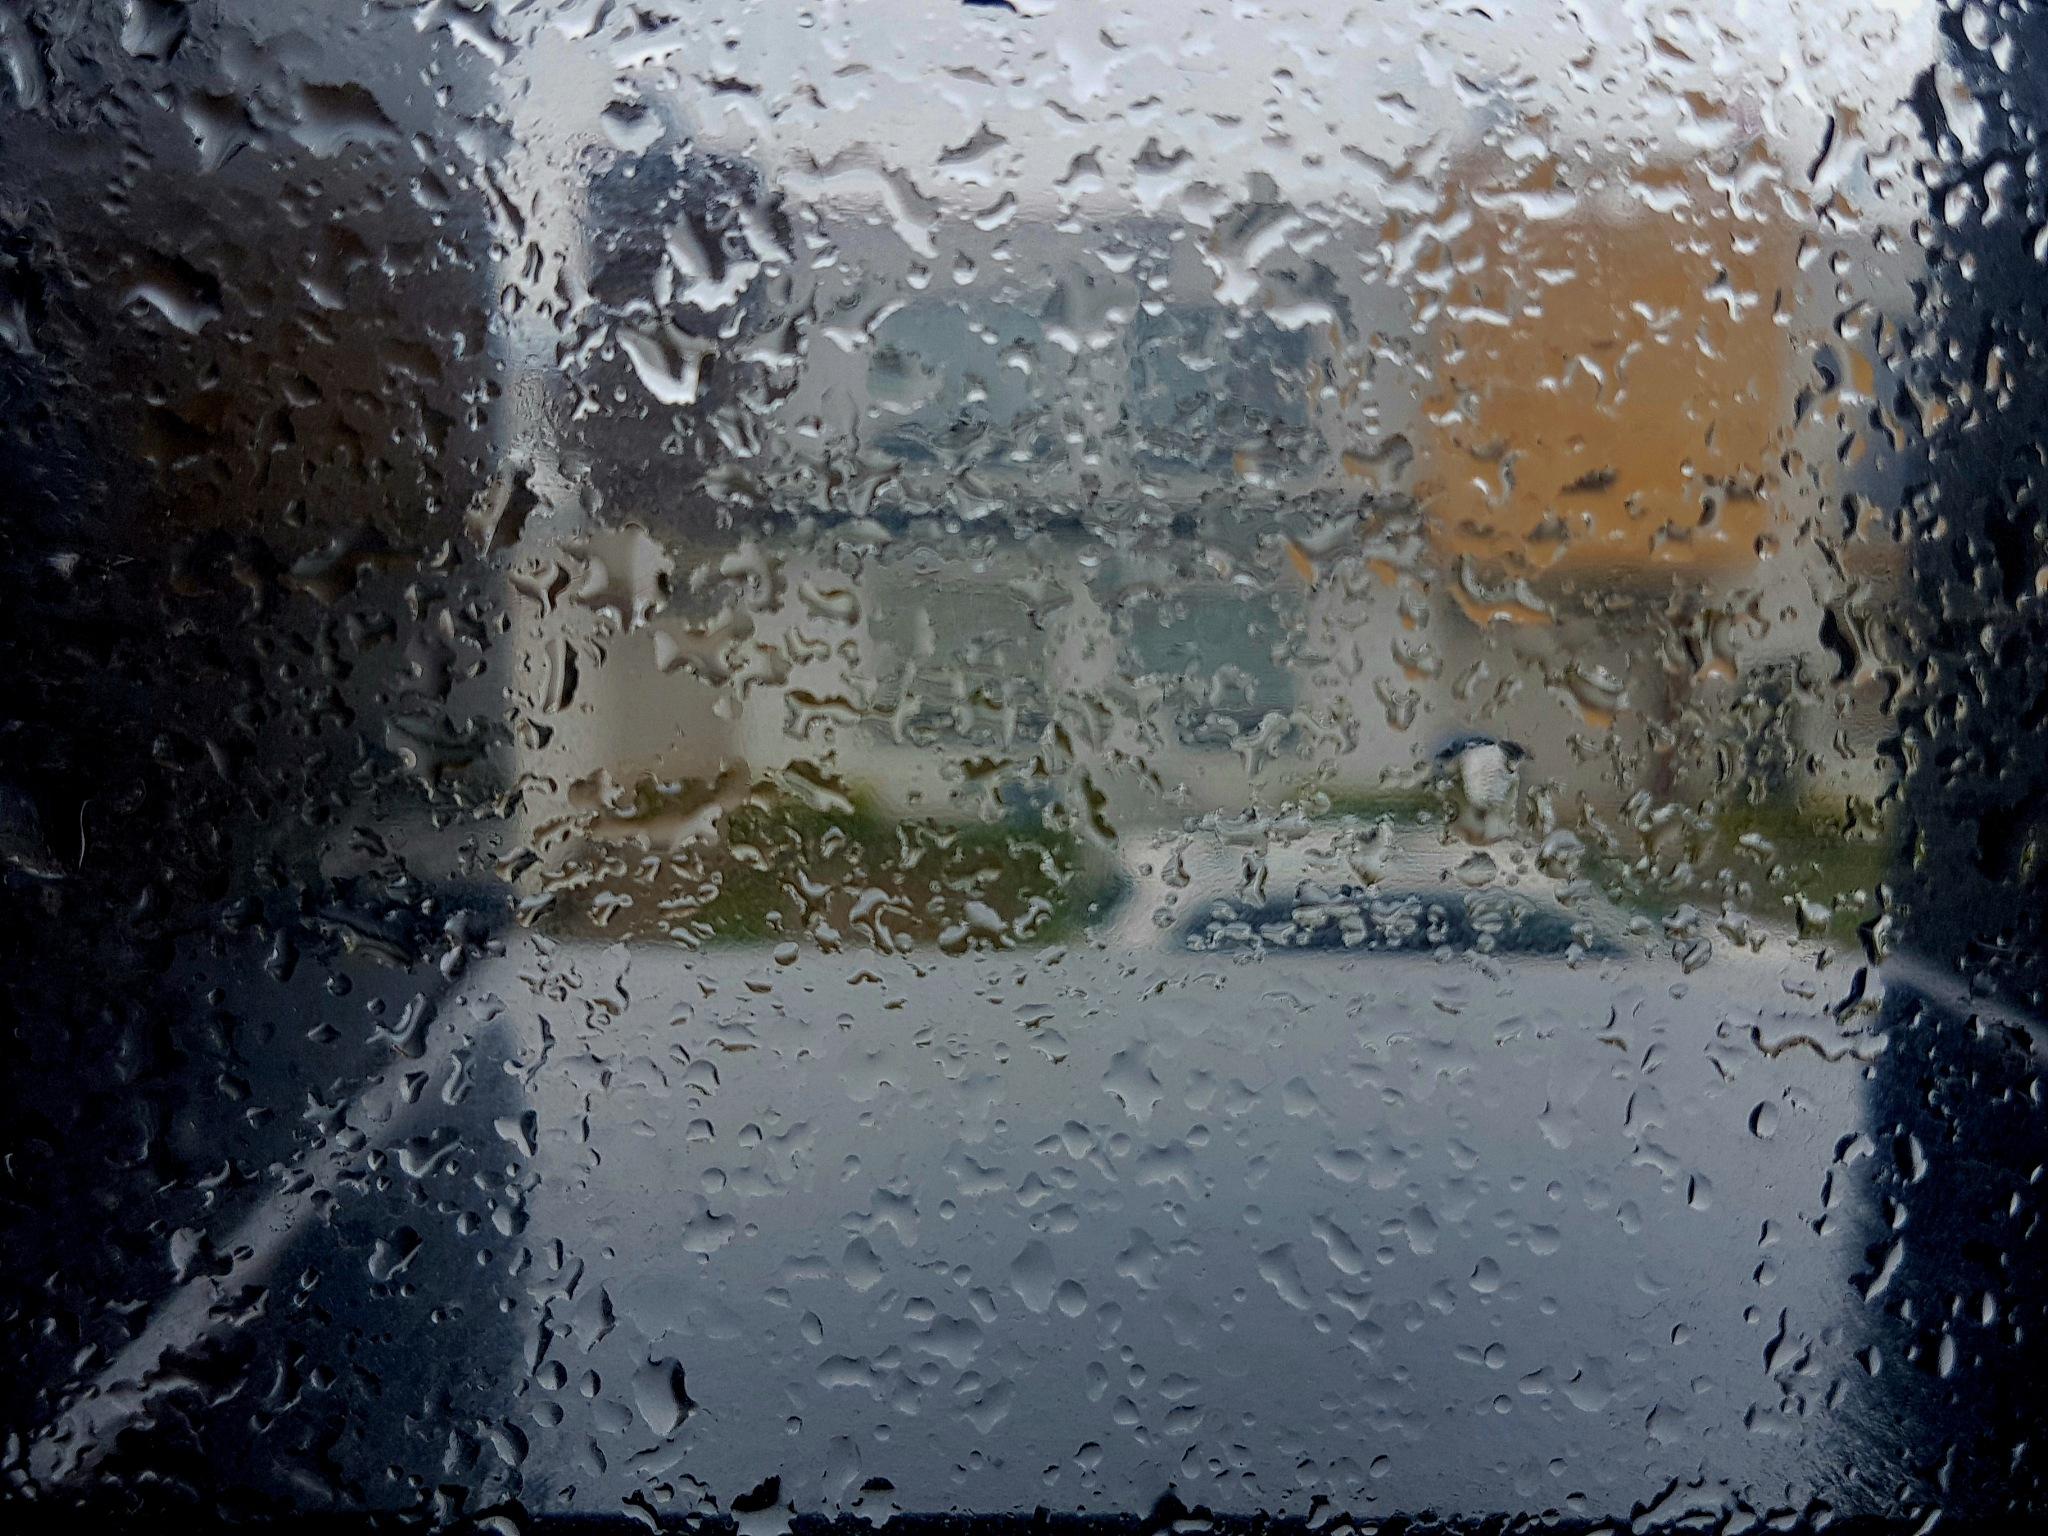 Behind rain by Francisco-Vernet